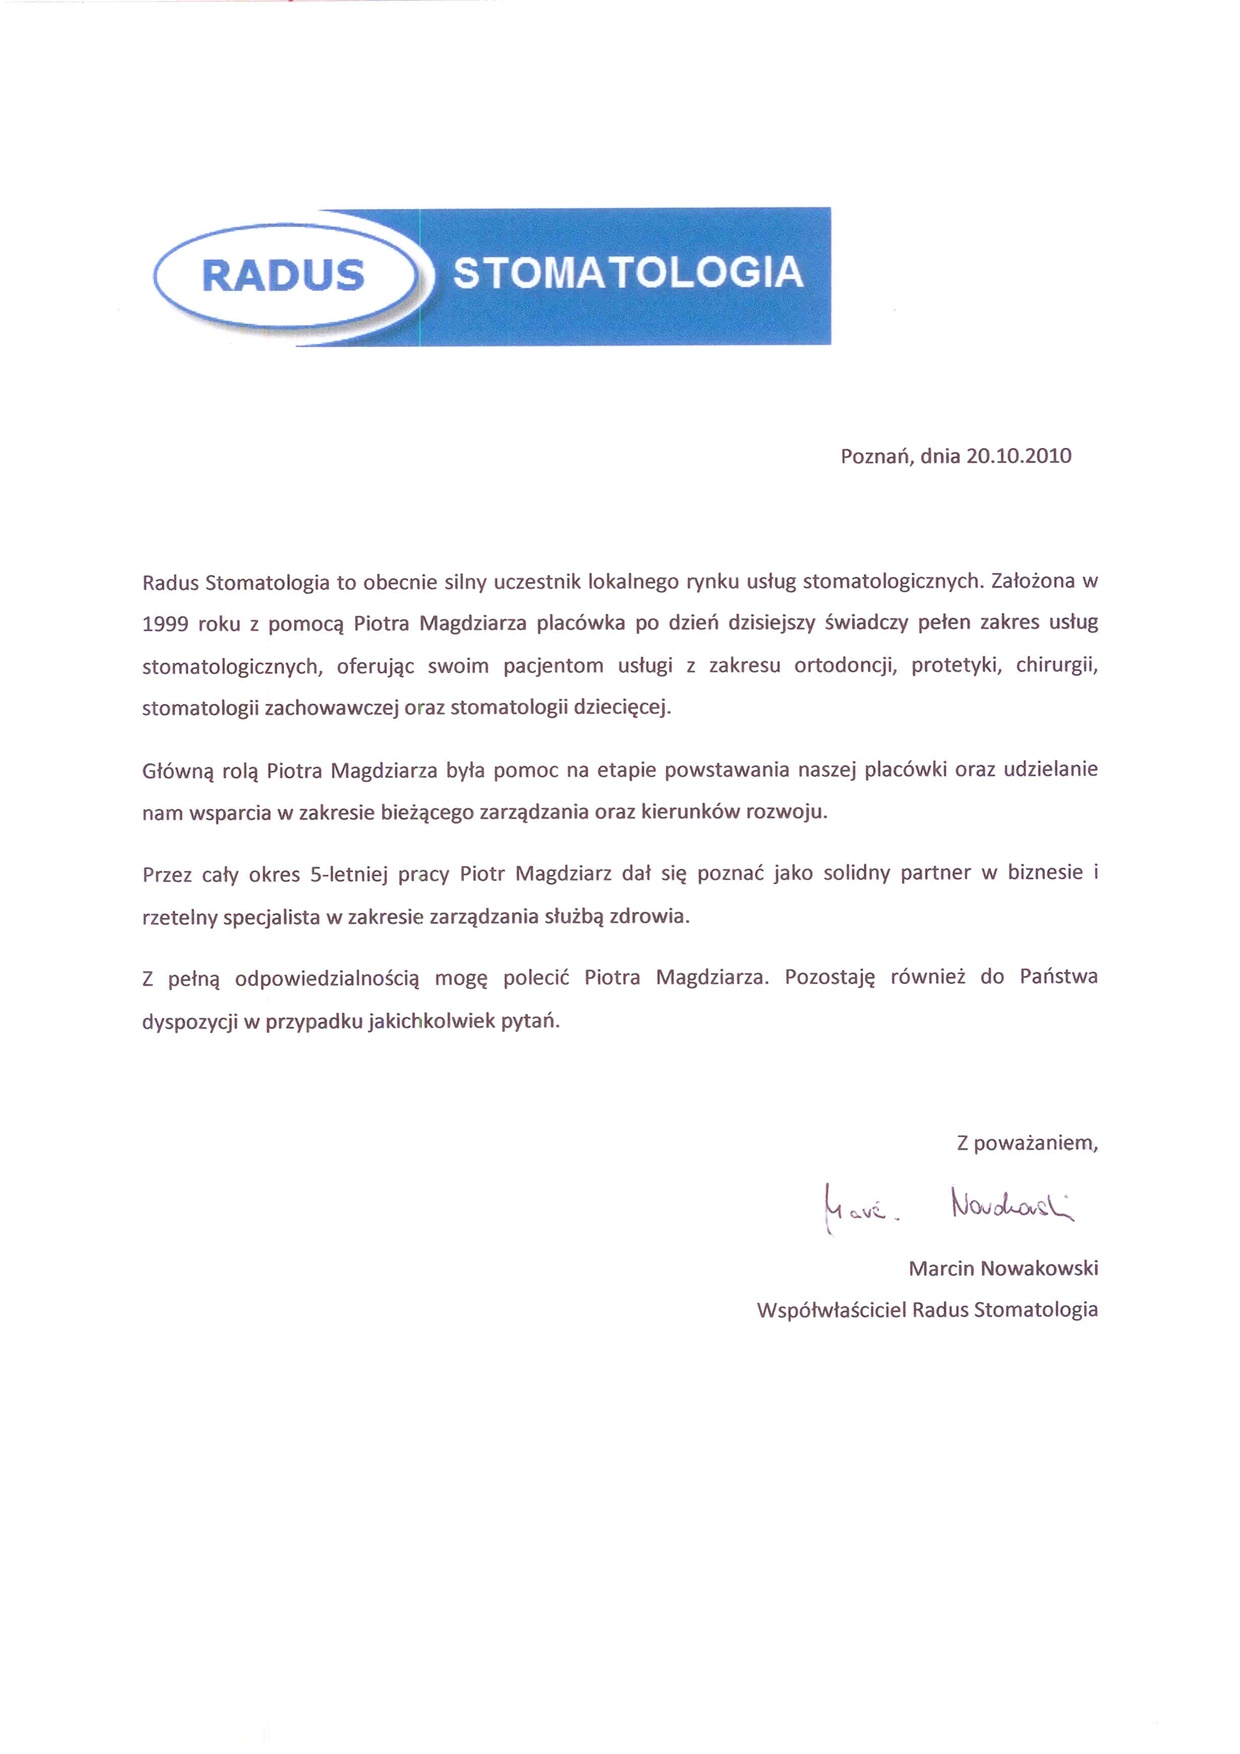 radus_stomatologia_referencje